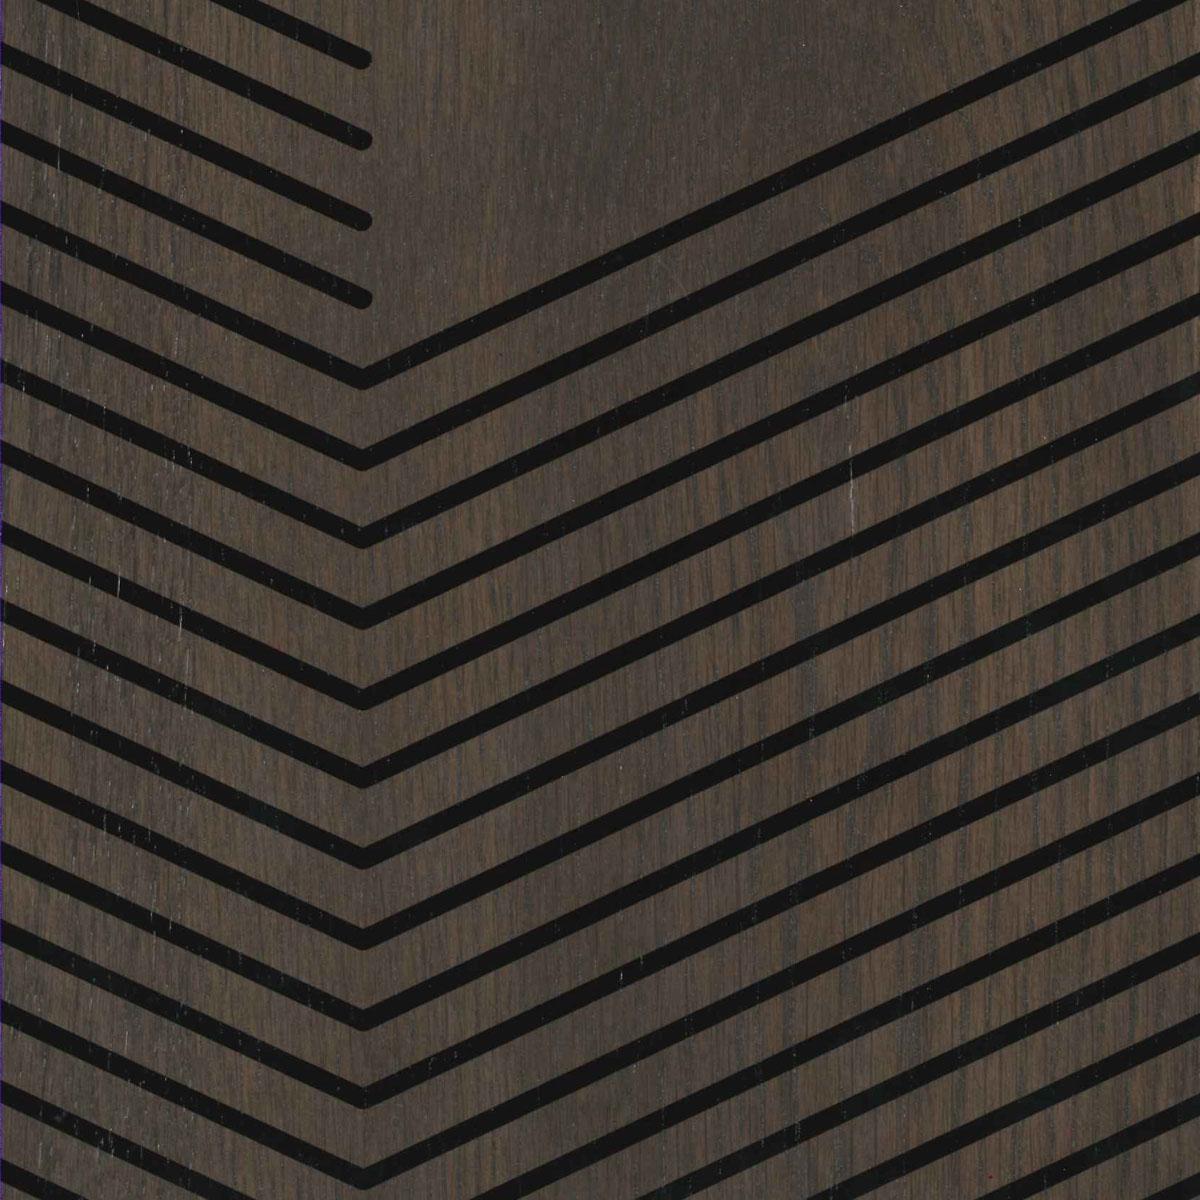 Tabletop Geometric